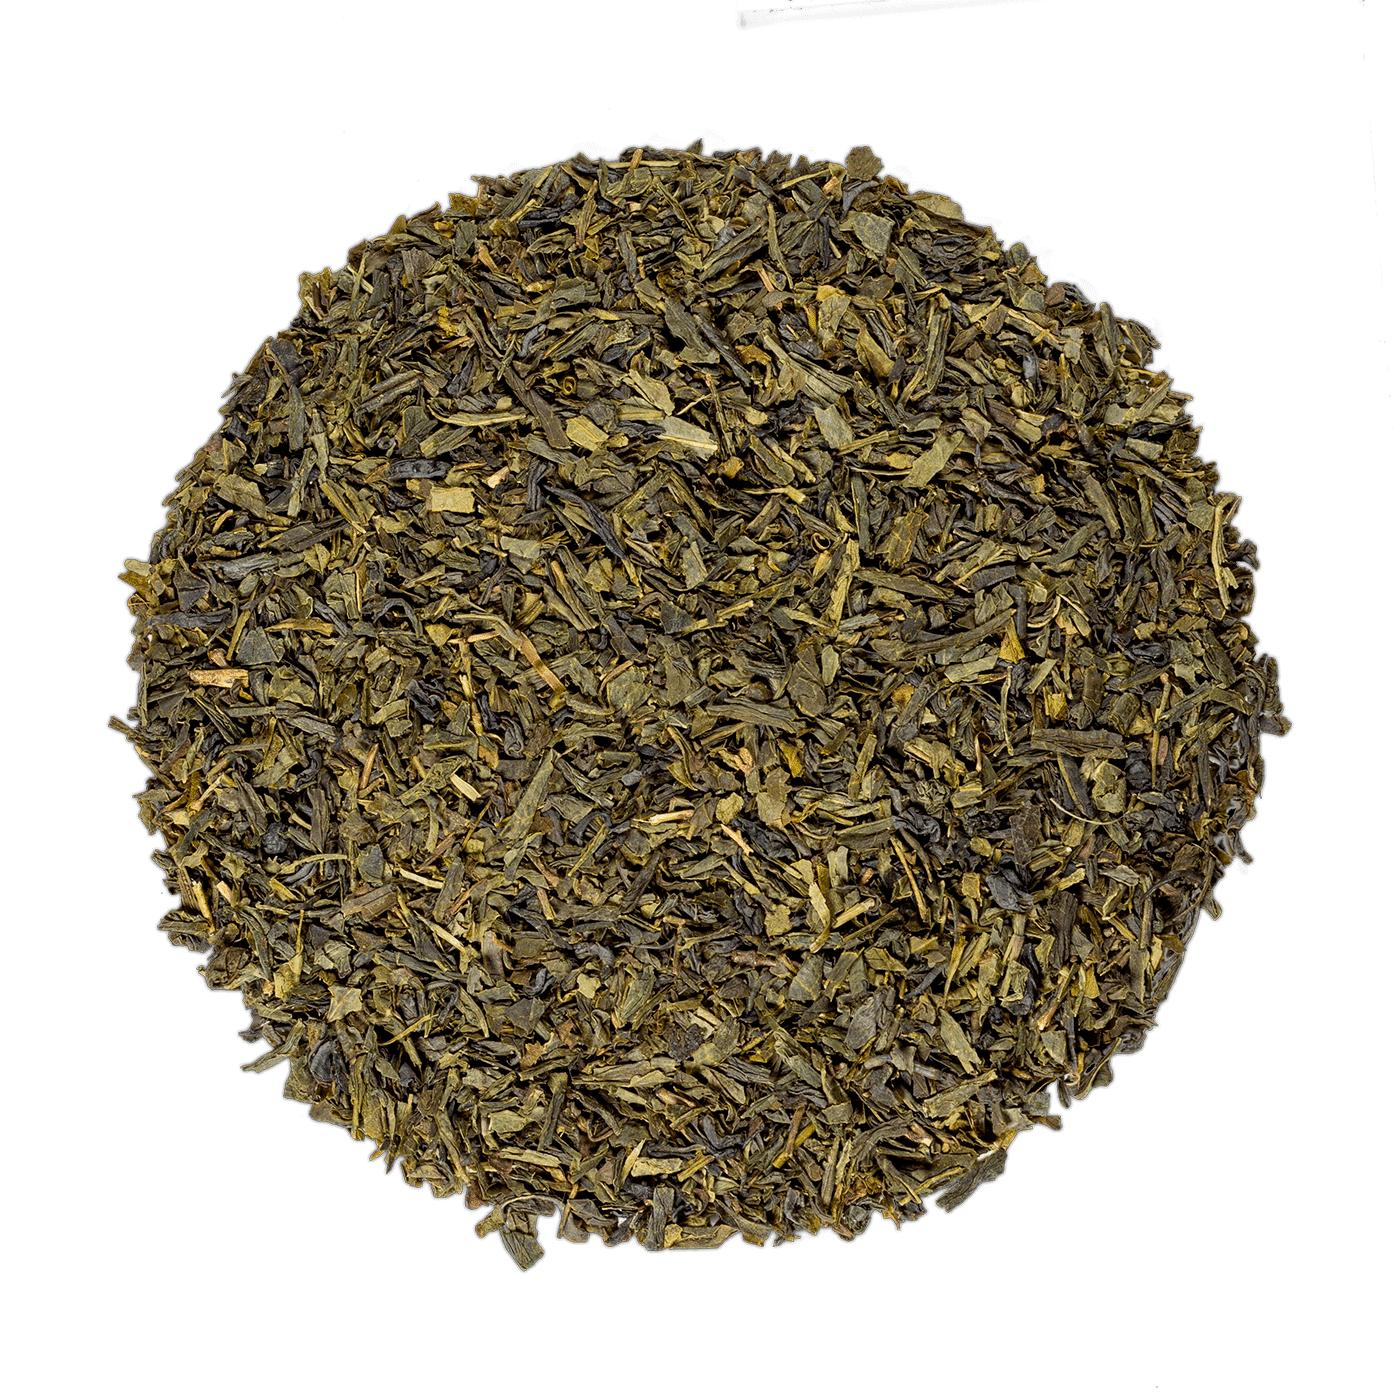 KUSMI TEA Vert Sencha bio - Thé vert grillé du Japon - Kusmi Tea